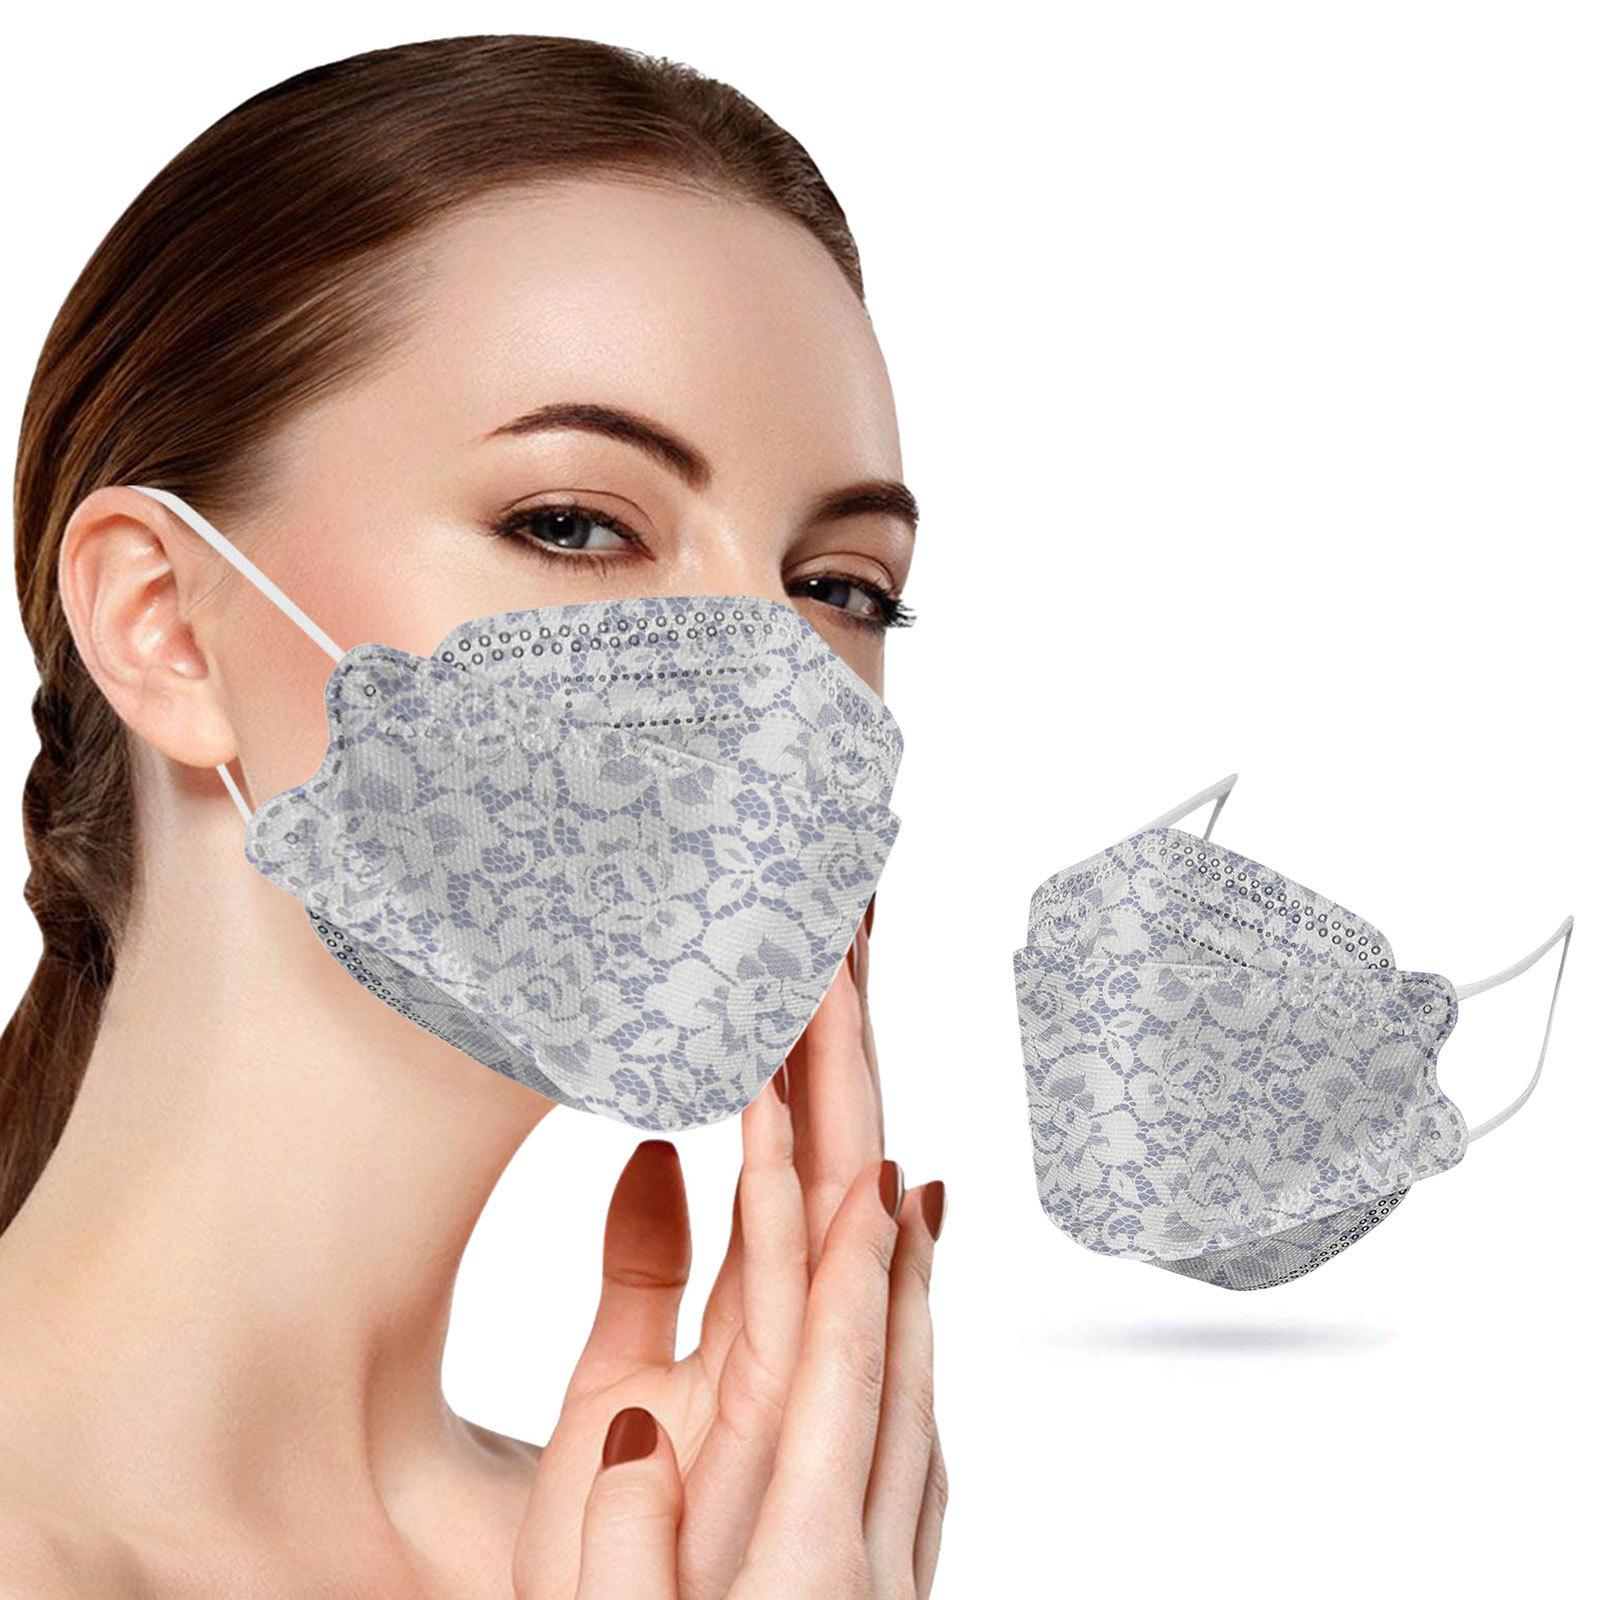 KF94不織布マスク 大人マスク 男女兼用マスク  使い捨てマスク3層保護 春夏通気性